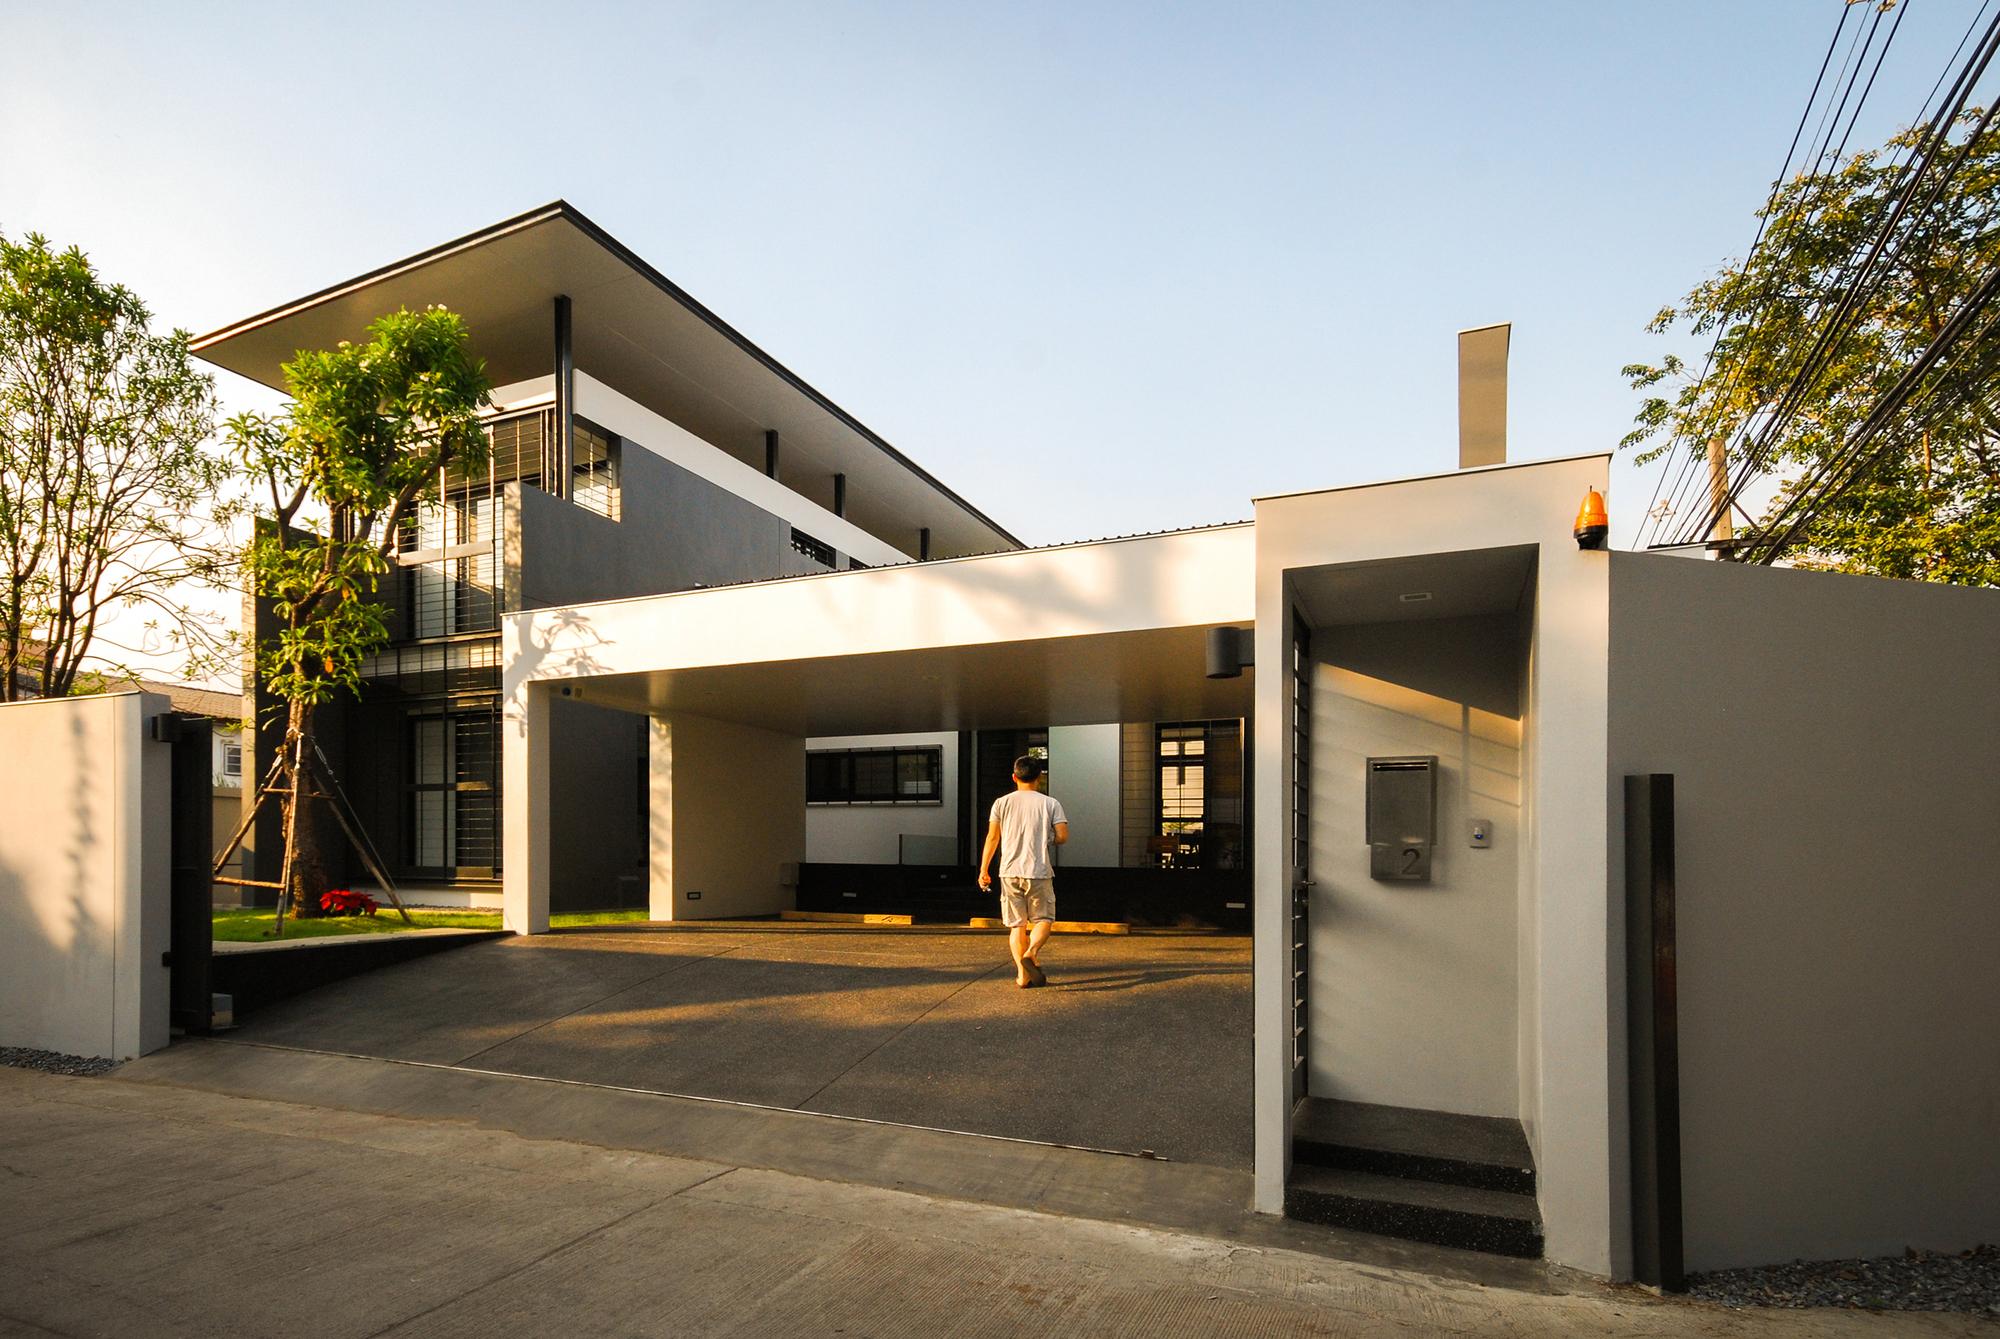 Gallery Of Three House Junsekino Architect And Design 1